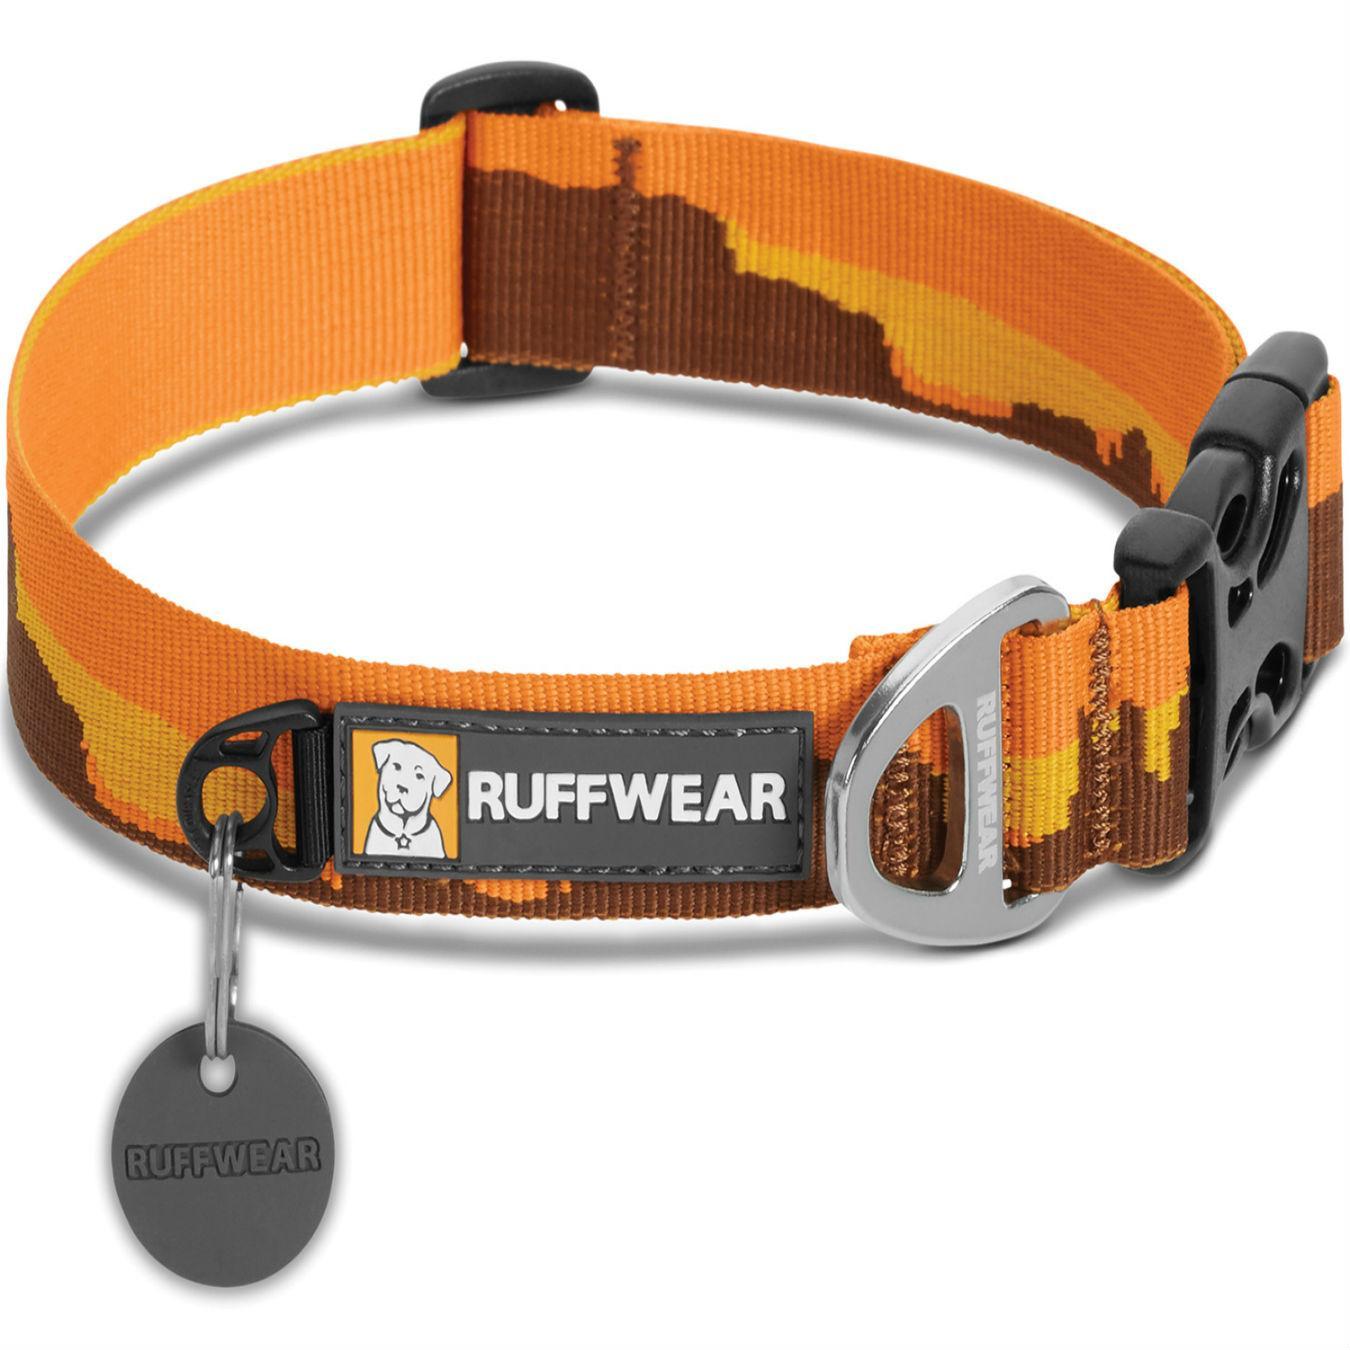 Hoopie Dog Collar by RuffWear - Monument Valley